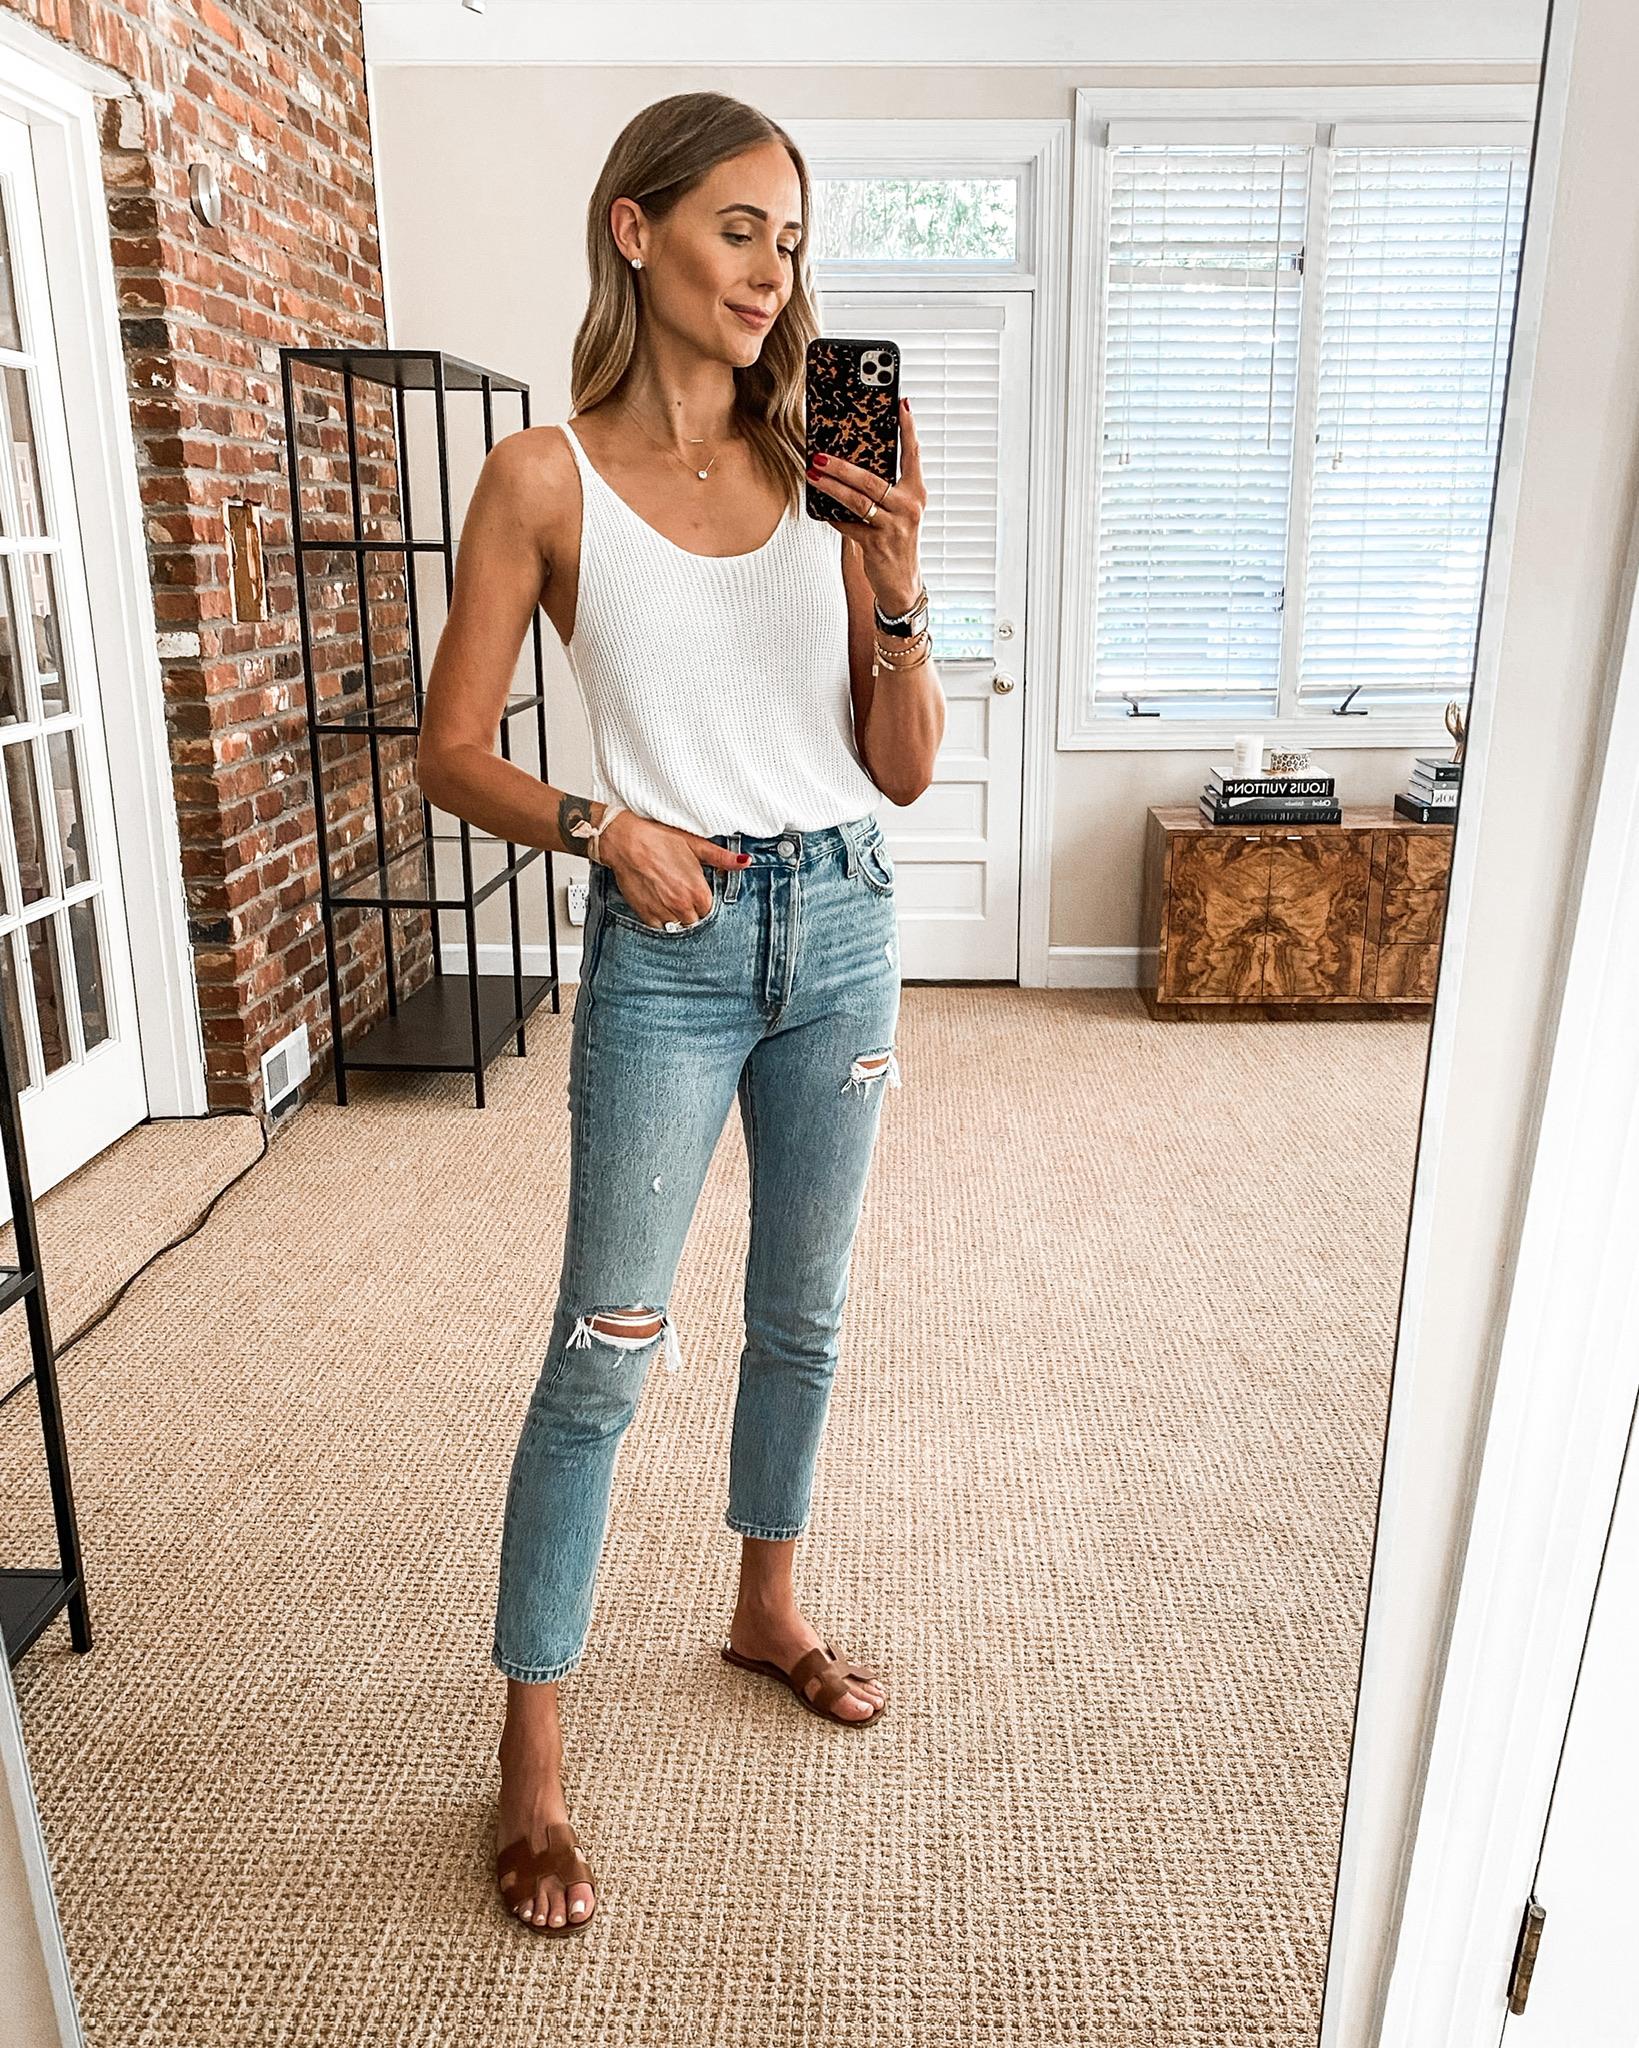 Fashion Jackson Wearing Amazon Fashion White Sweater Tank Levis 501 Ripped Skinny Jeans Tan Hermes Sandals